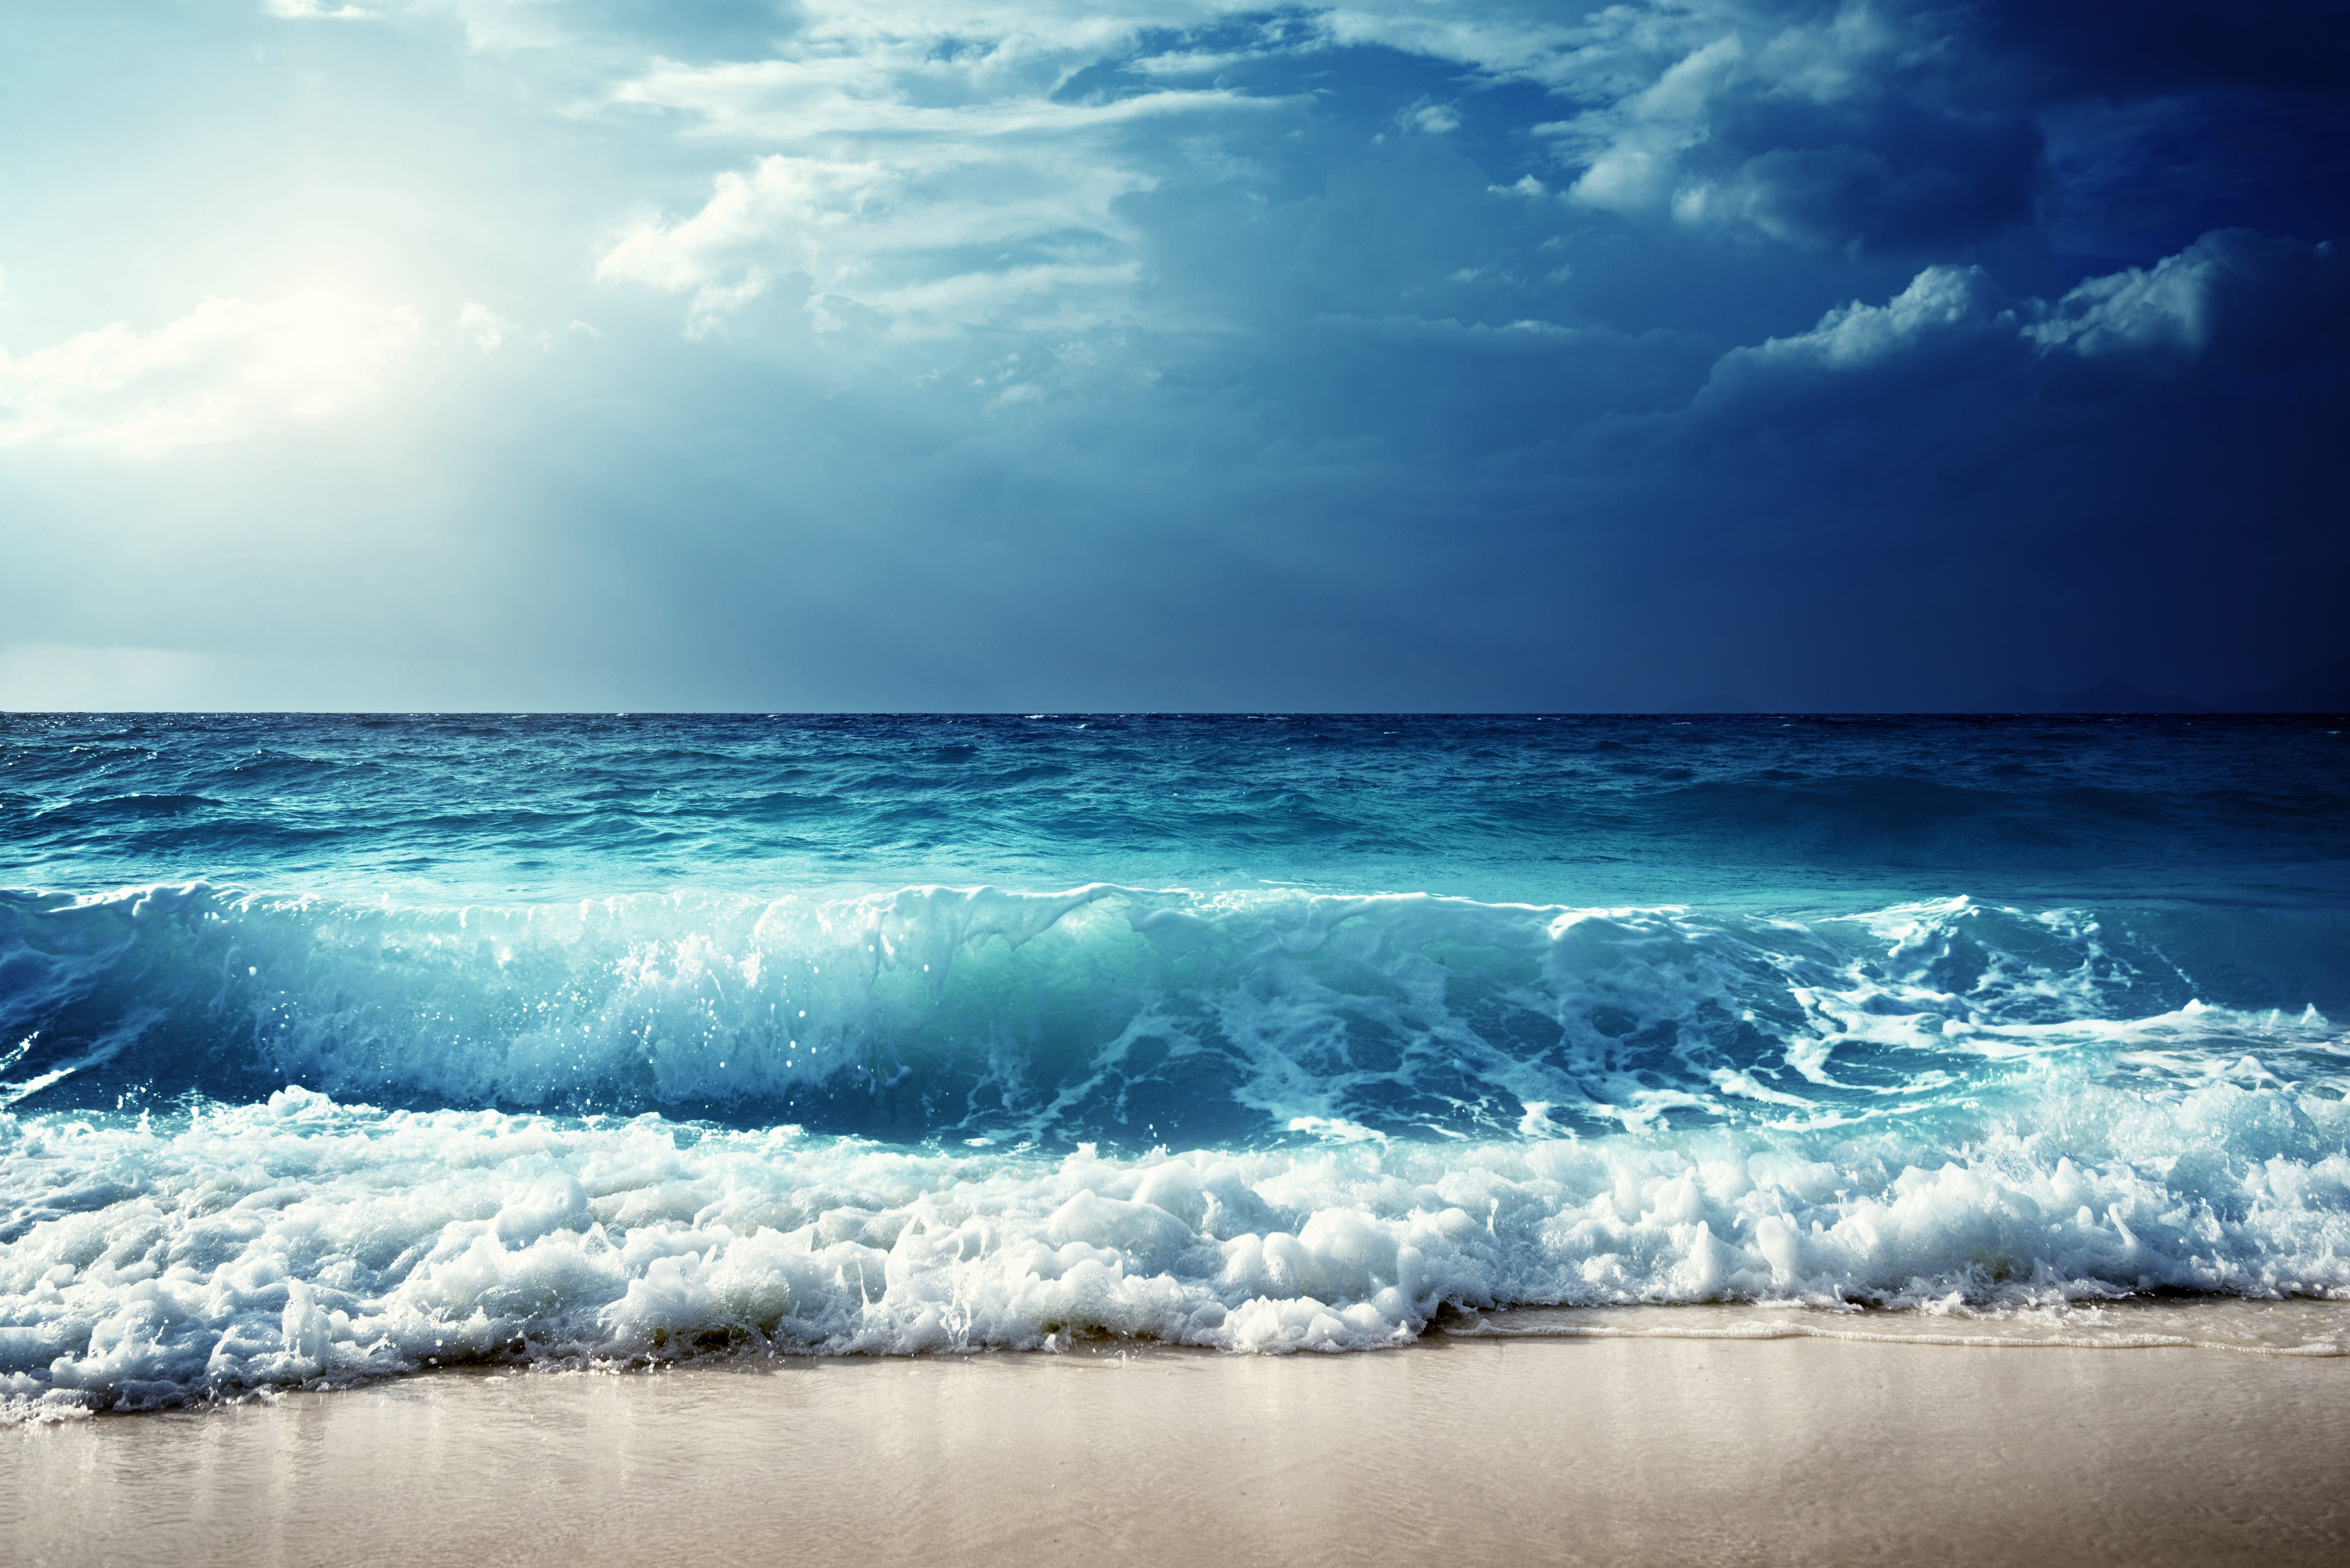 1920x1080 Sky Sea Waves Horizon 5k Laptop Full HD 1080P HD ...